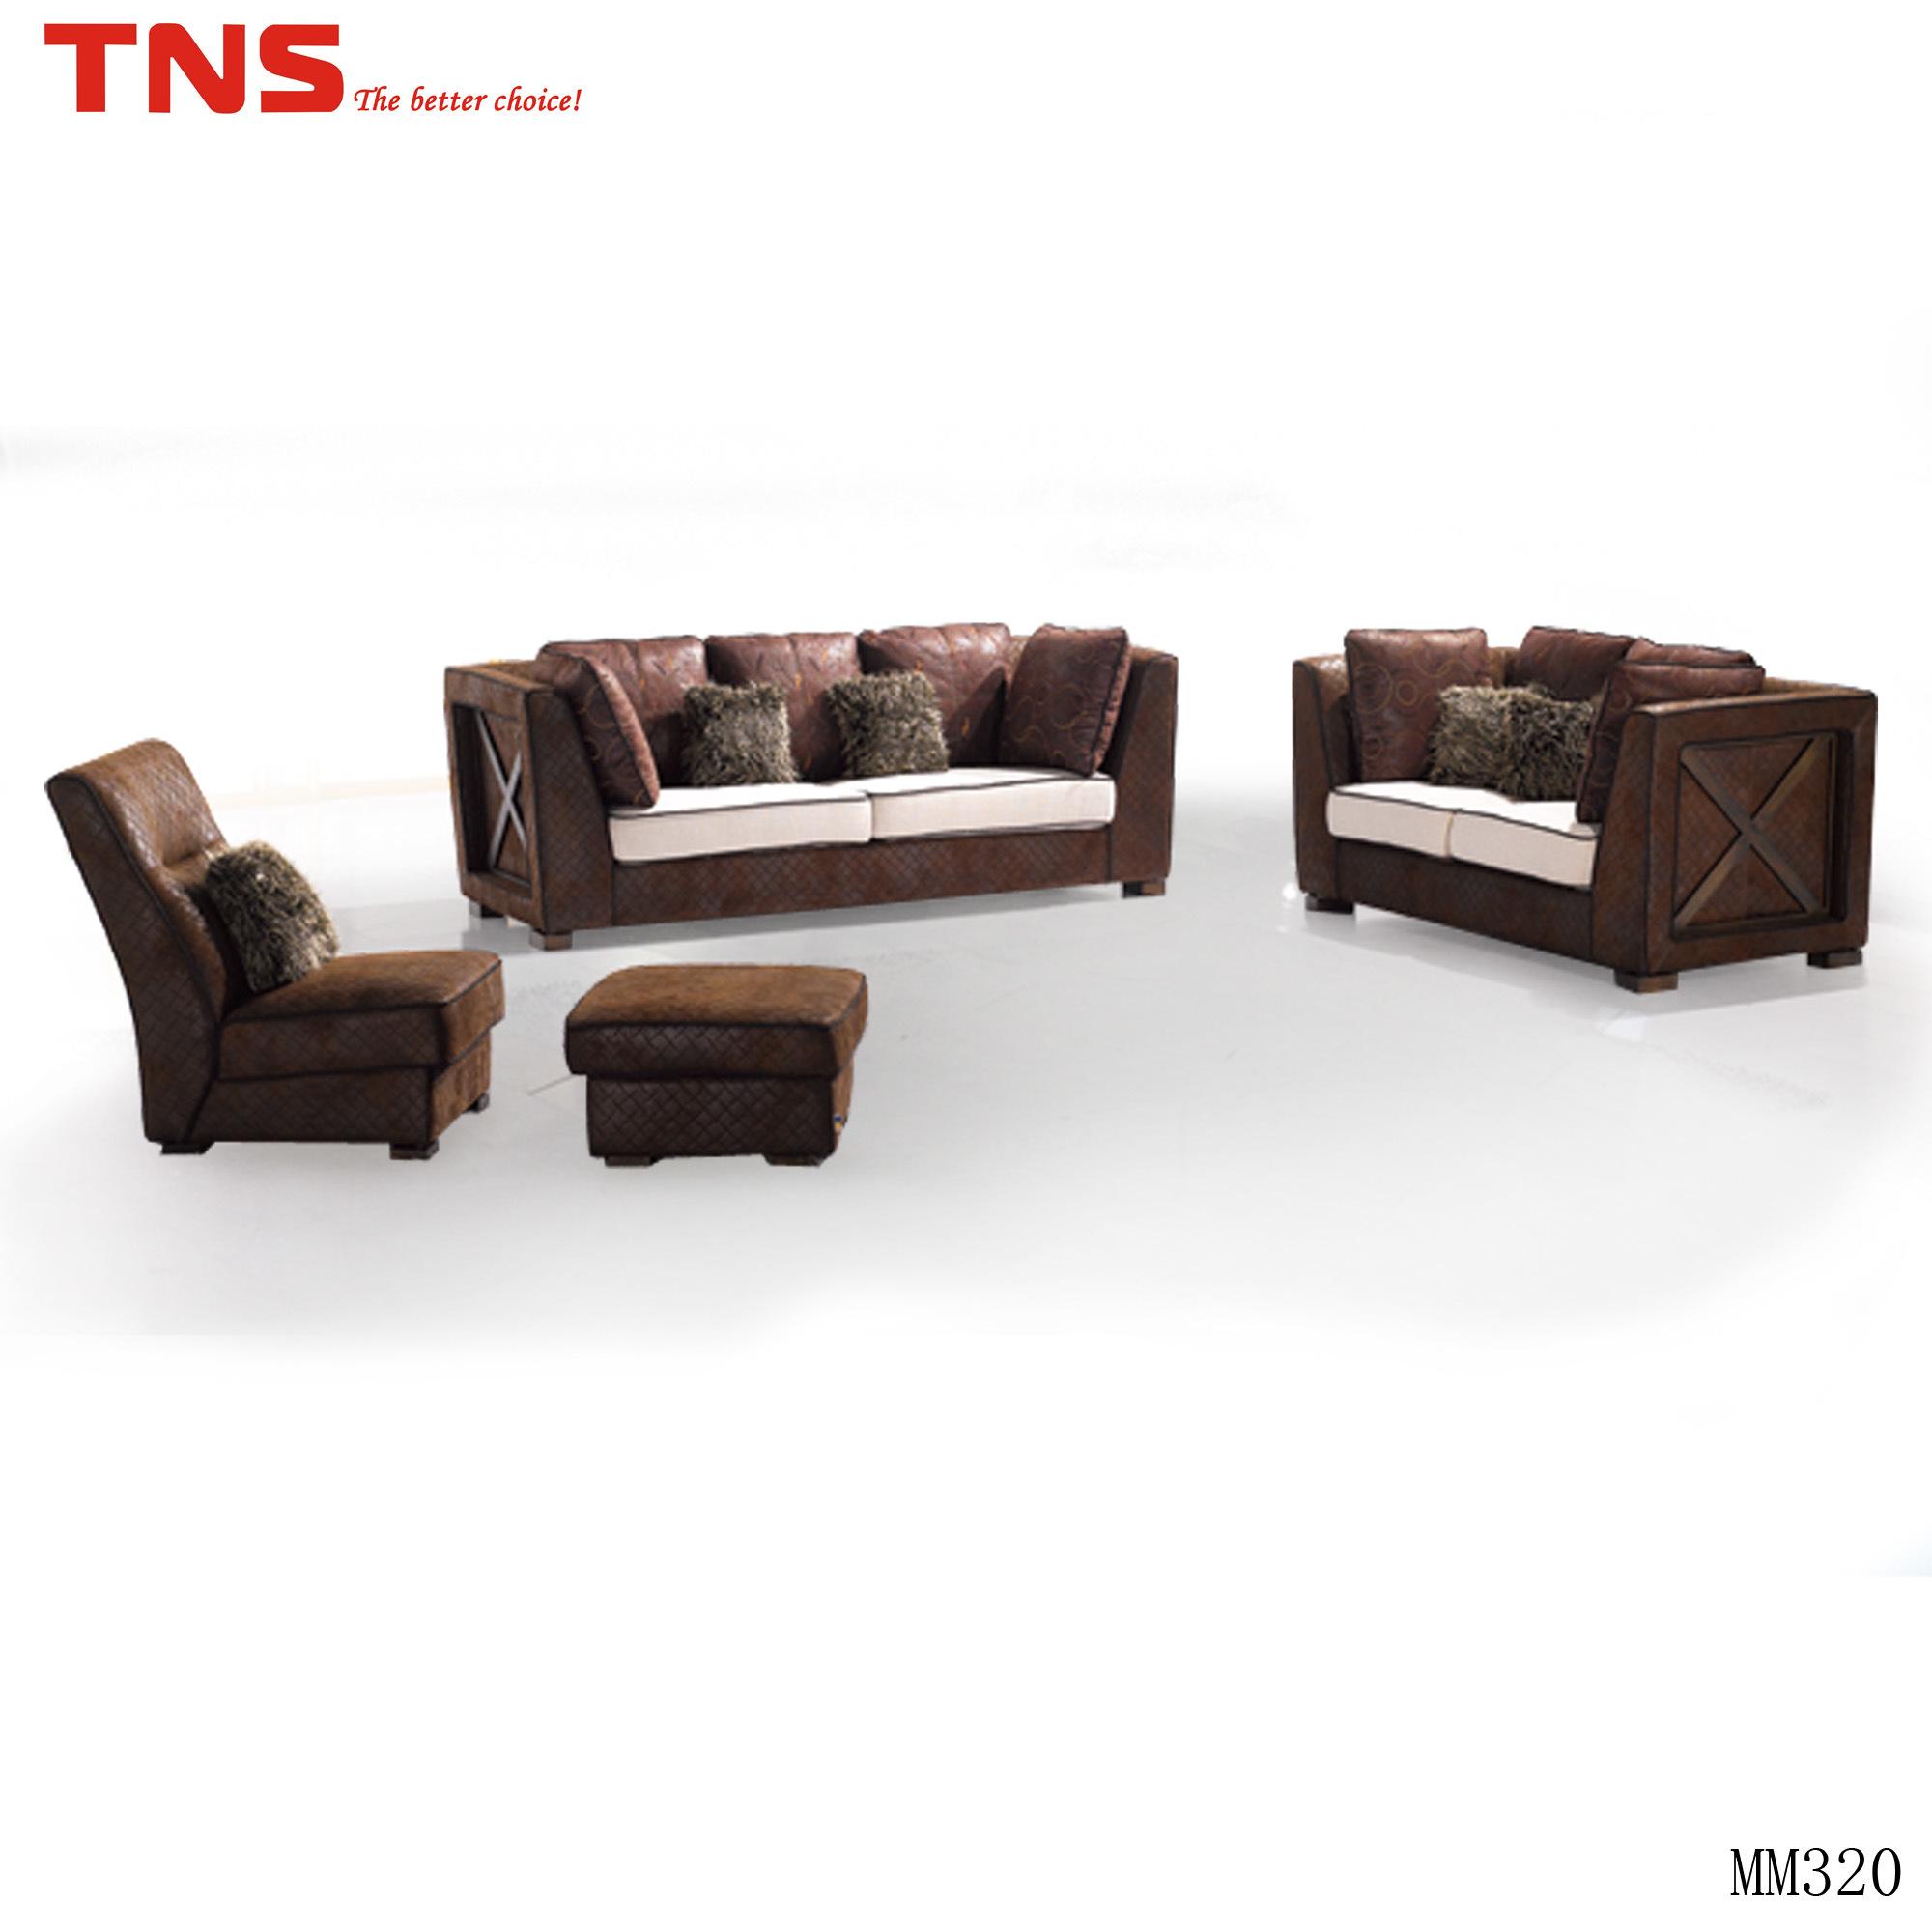 China moder living room furniture mm320 e china living for F living room furniture